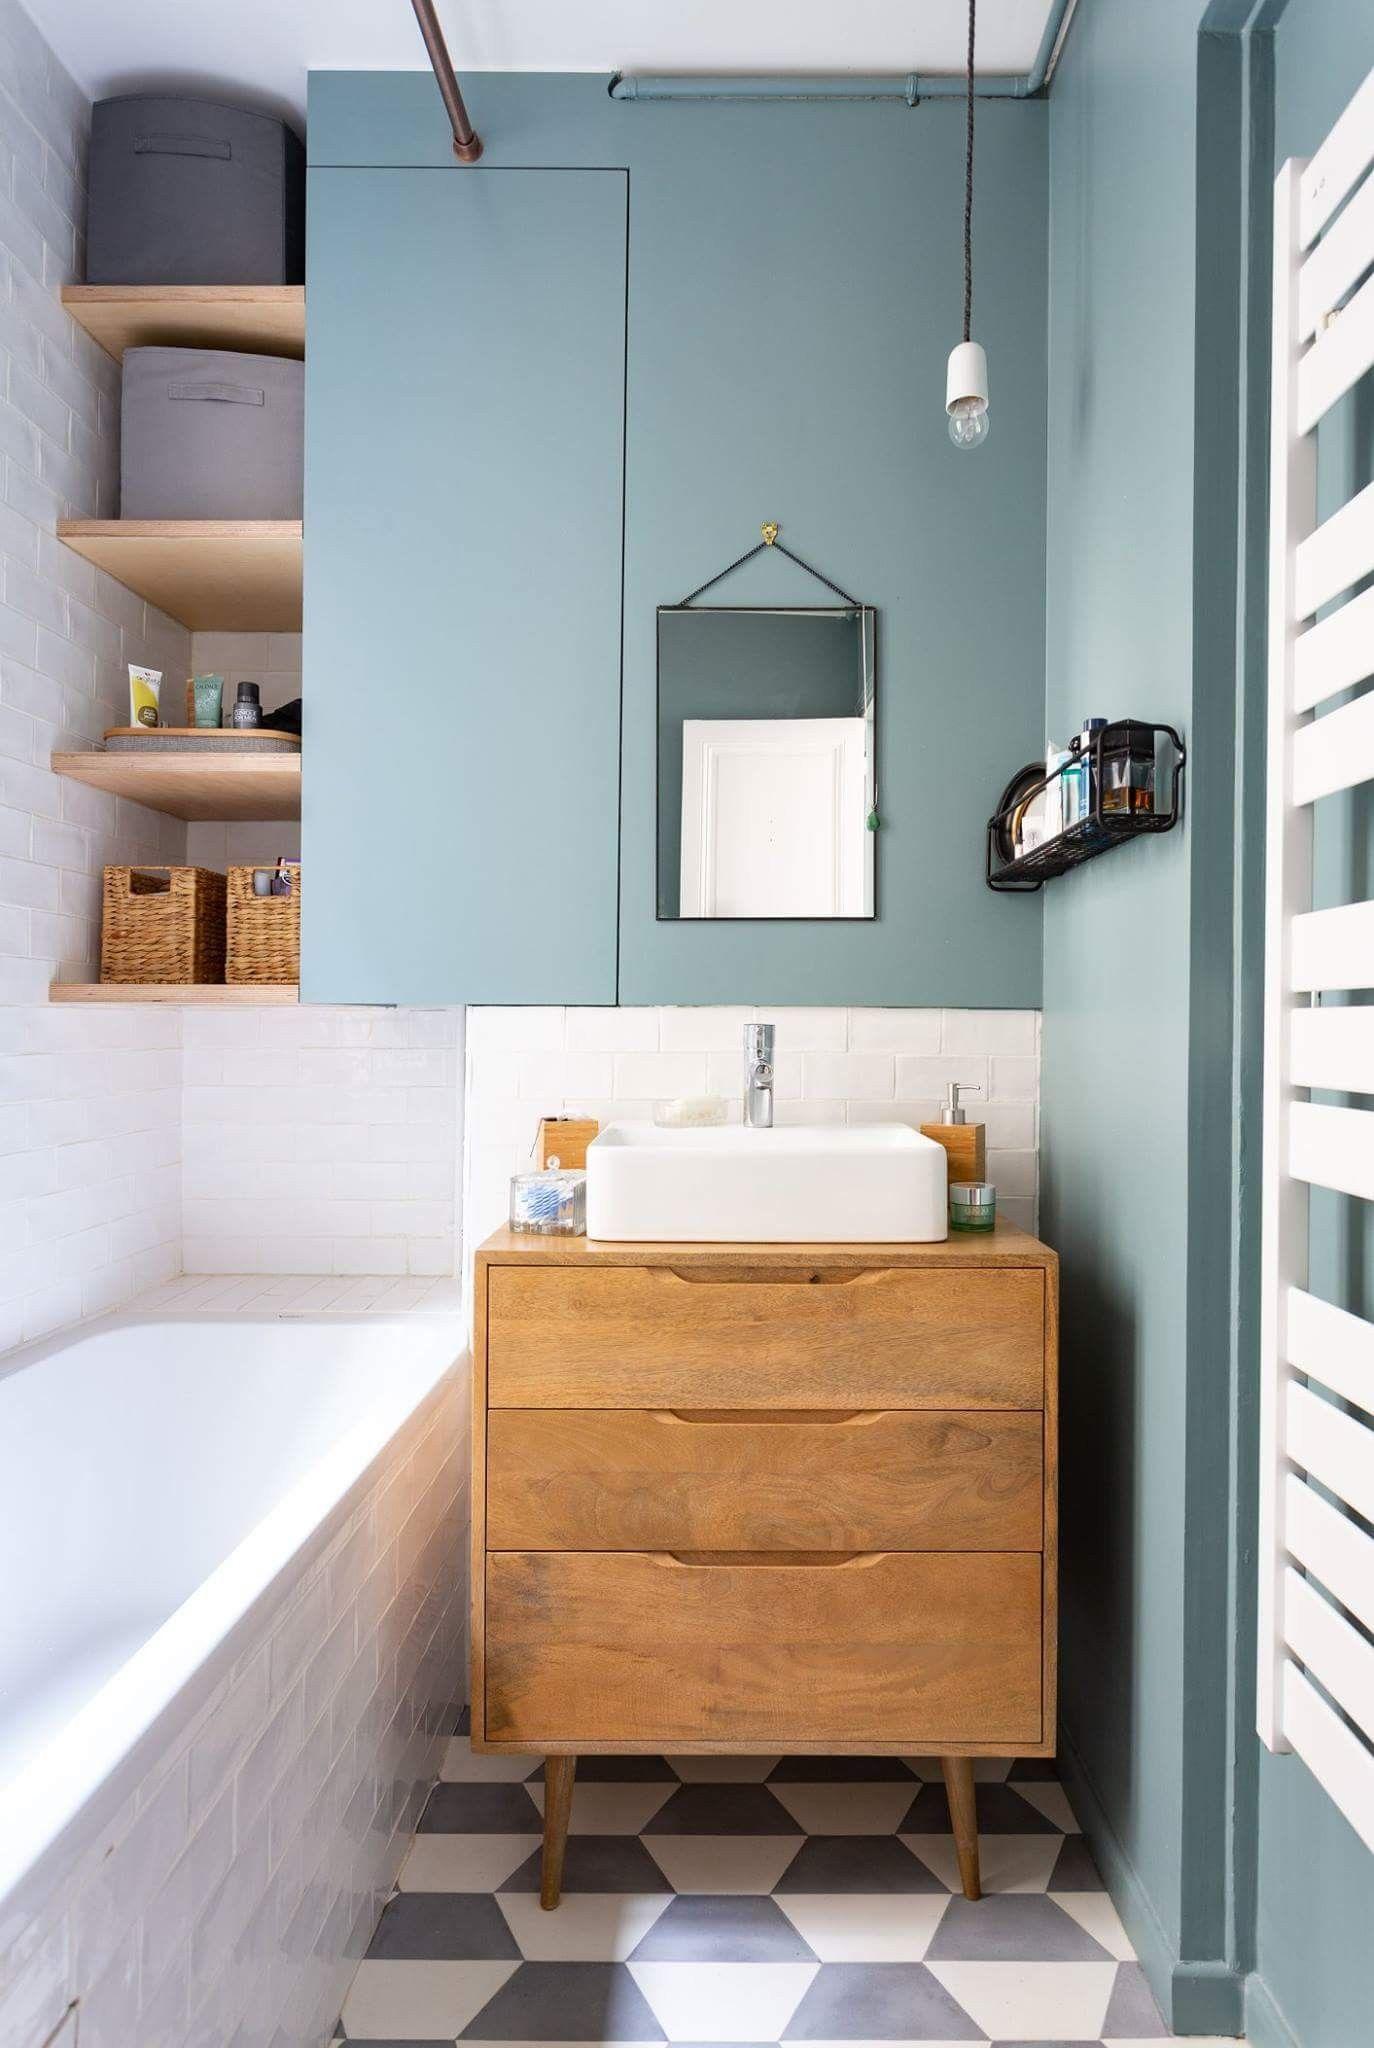 Moderniser Salle De Bain meuble sdb maison du monde | relooker salle de bain, idée